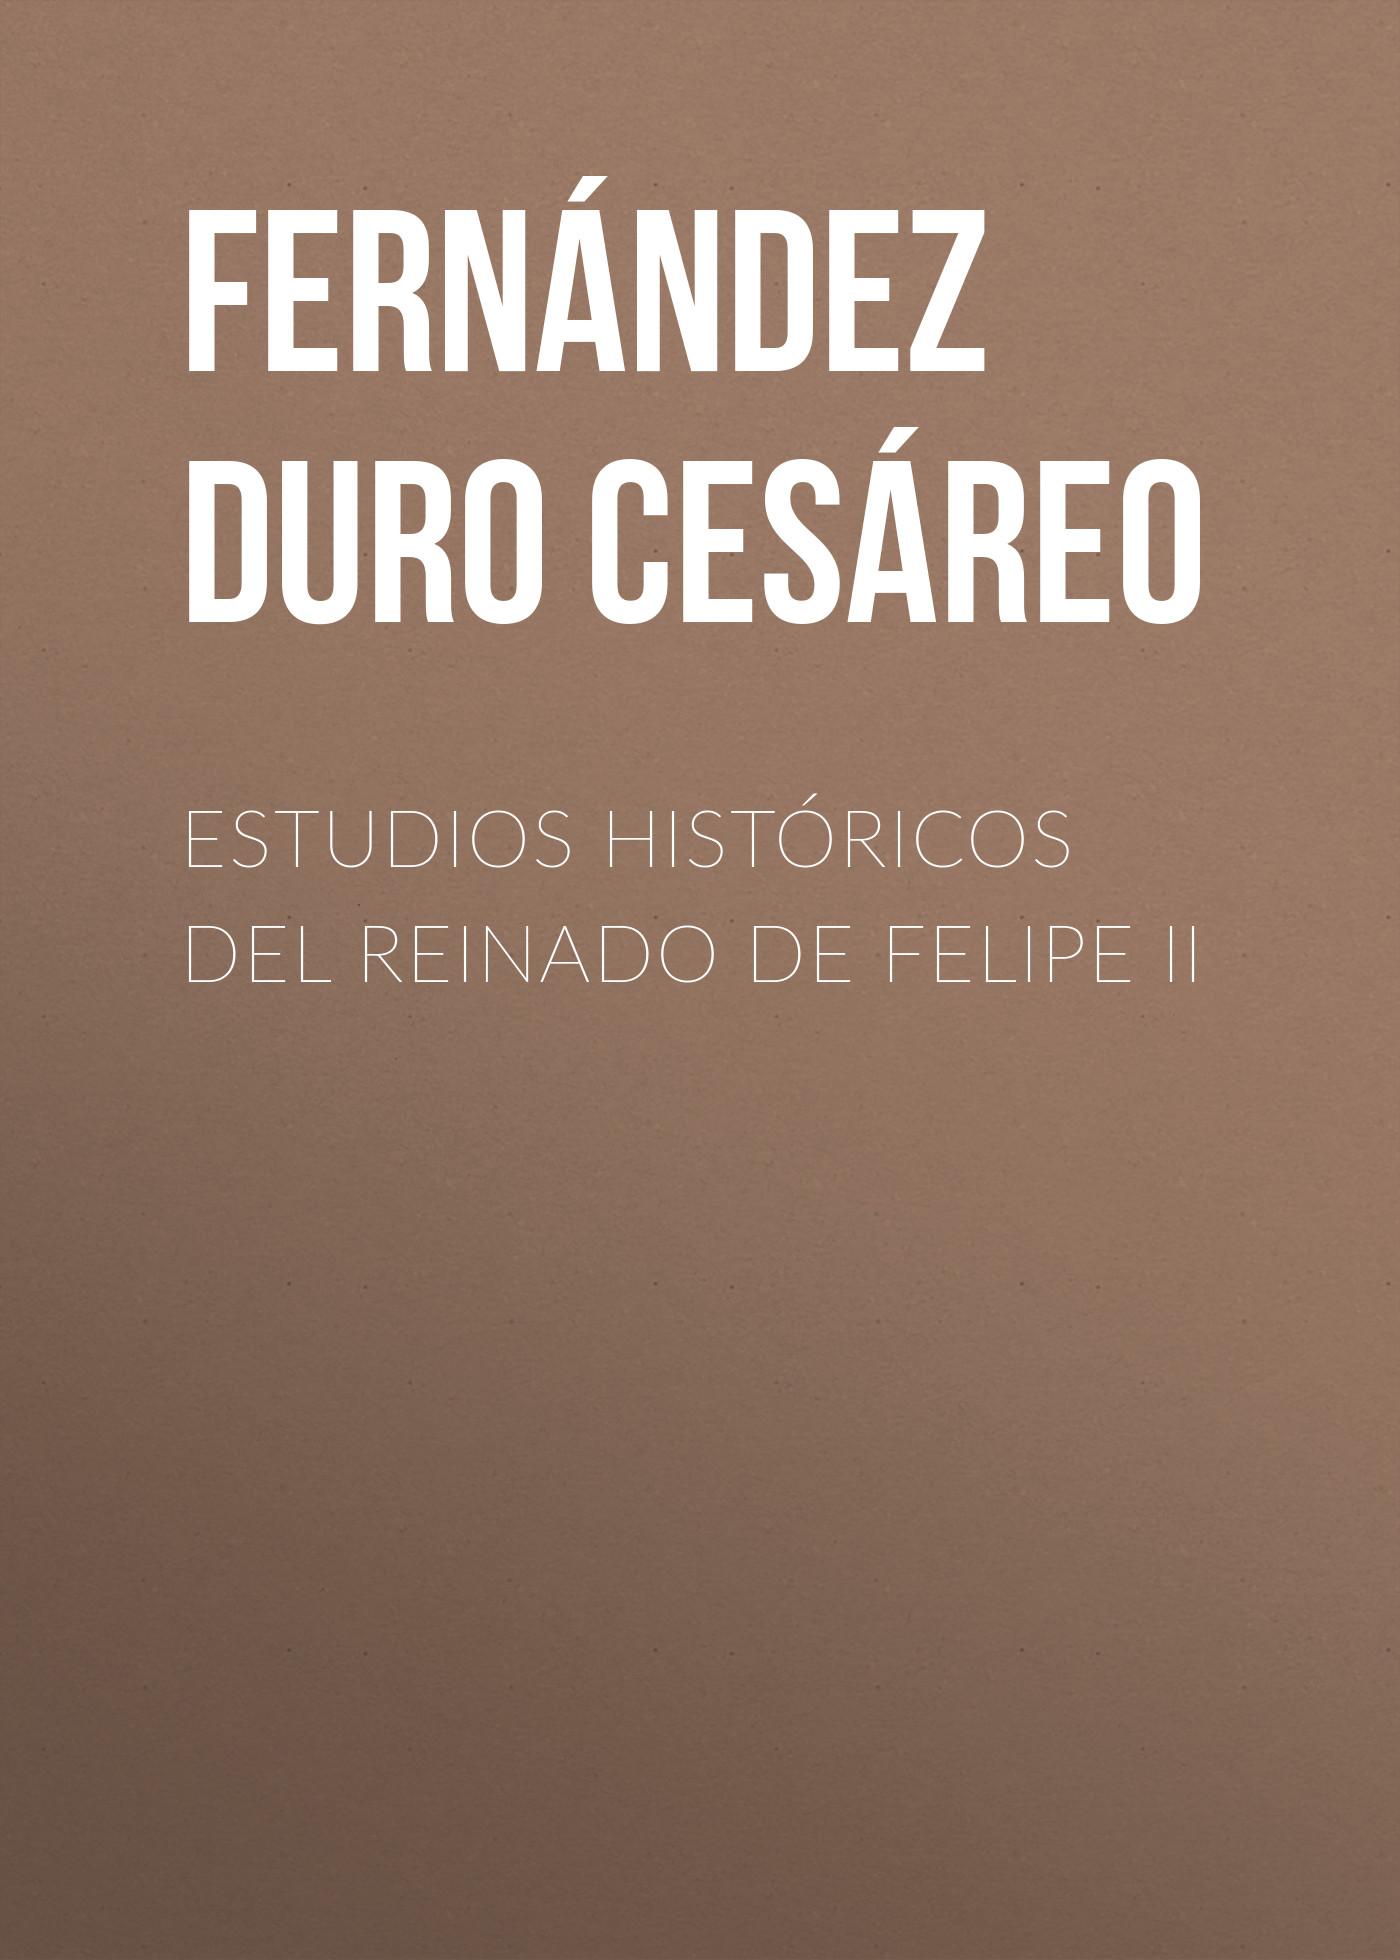 Fernández Duro Cesáreo Estudios históricos del reinado de Felipe II alejandro fernández torrelavega